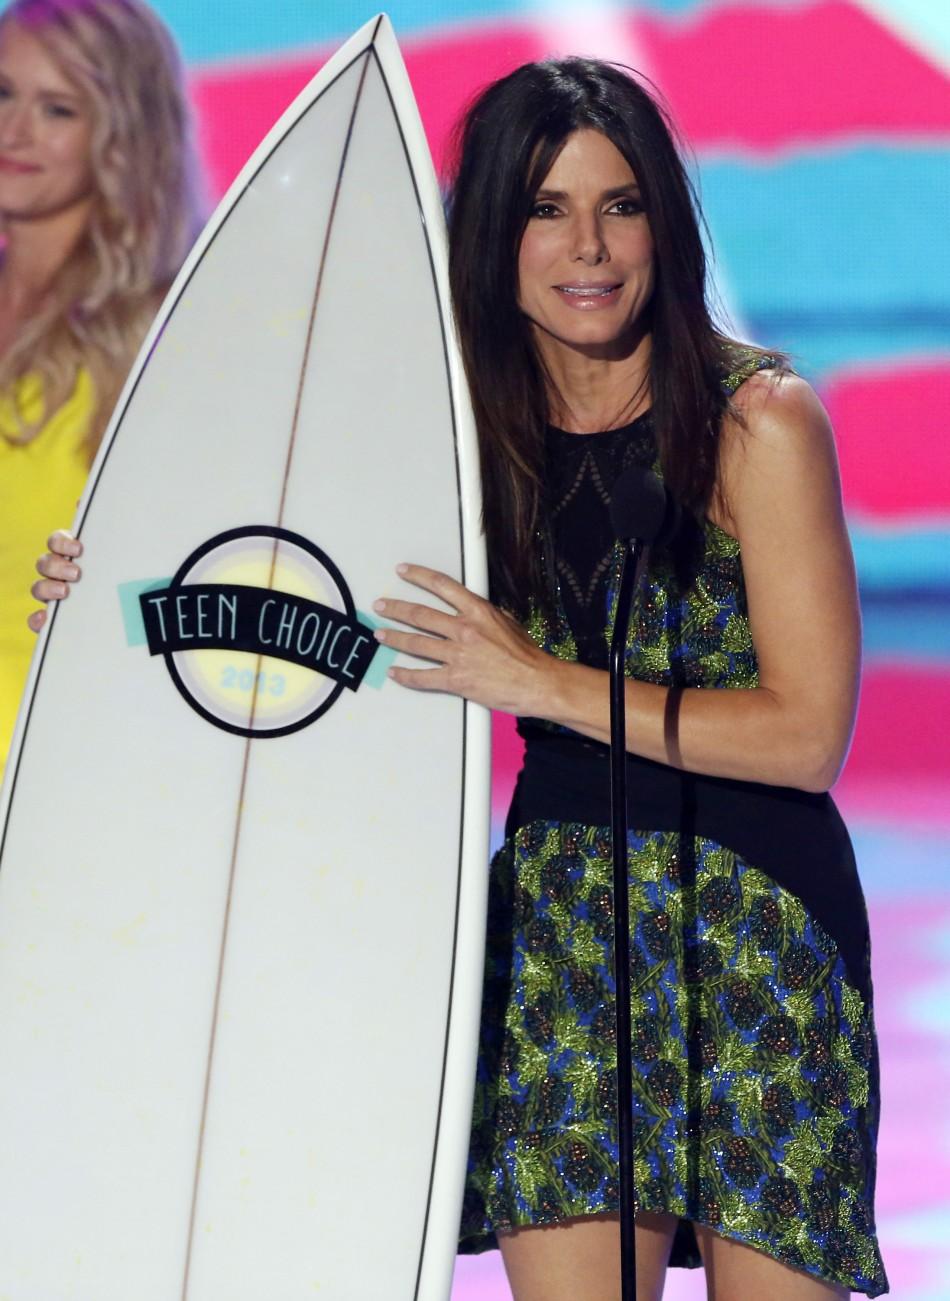 Actress Sandra Bullock accepts the Choice Summer Movie Star: Female Award at the Teen Choice Awards 2013. (Photo: Reuters)